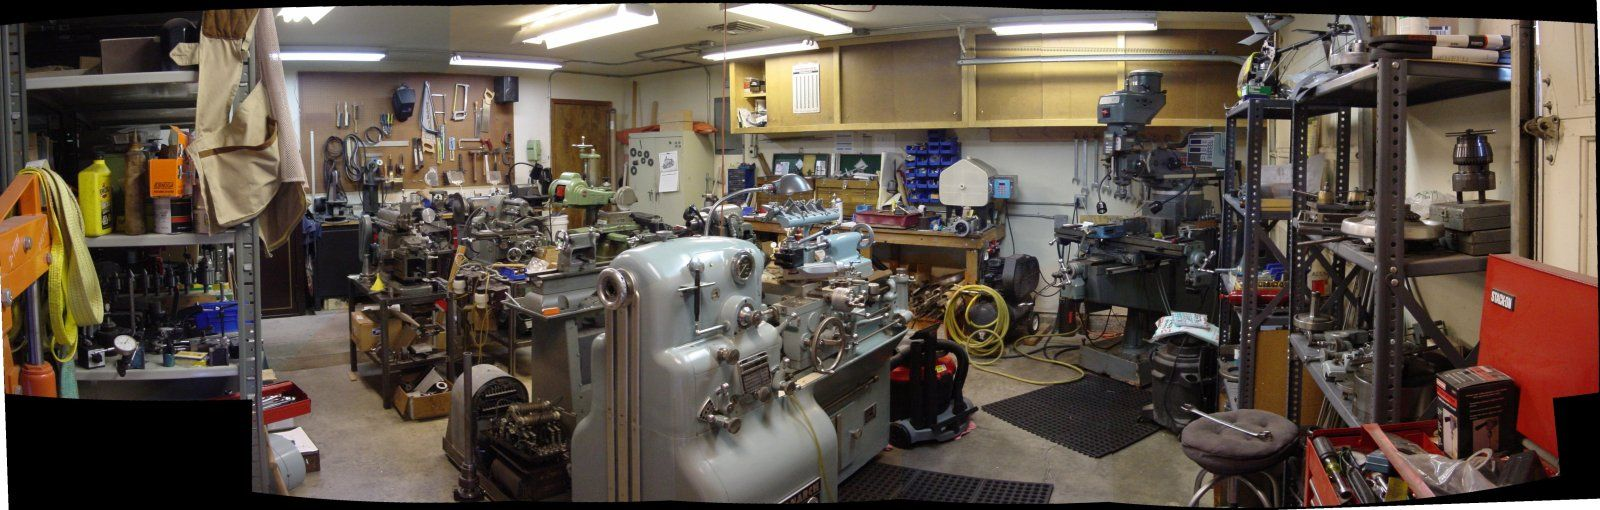 Home Machine Shop Home Workshop Hall Of Fame Tools Pinterest